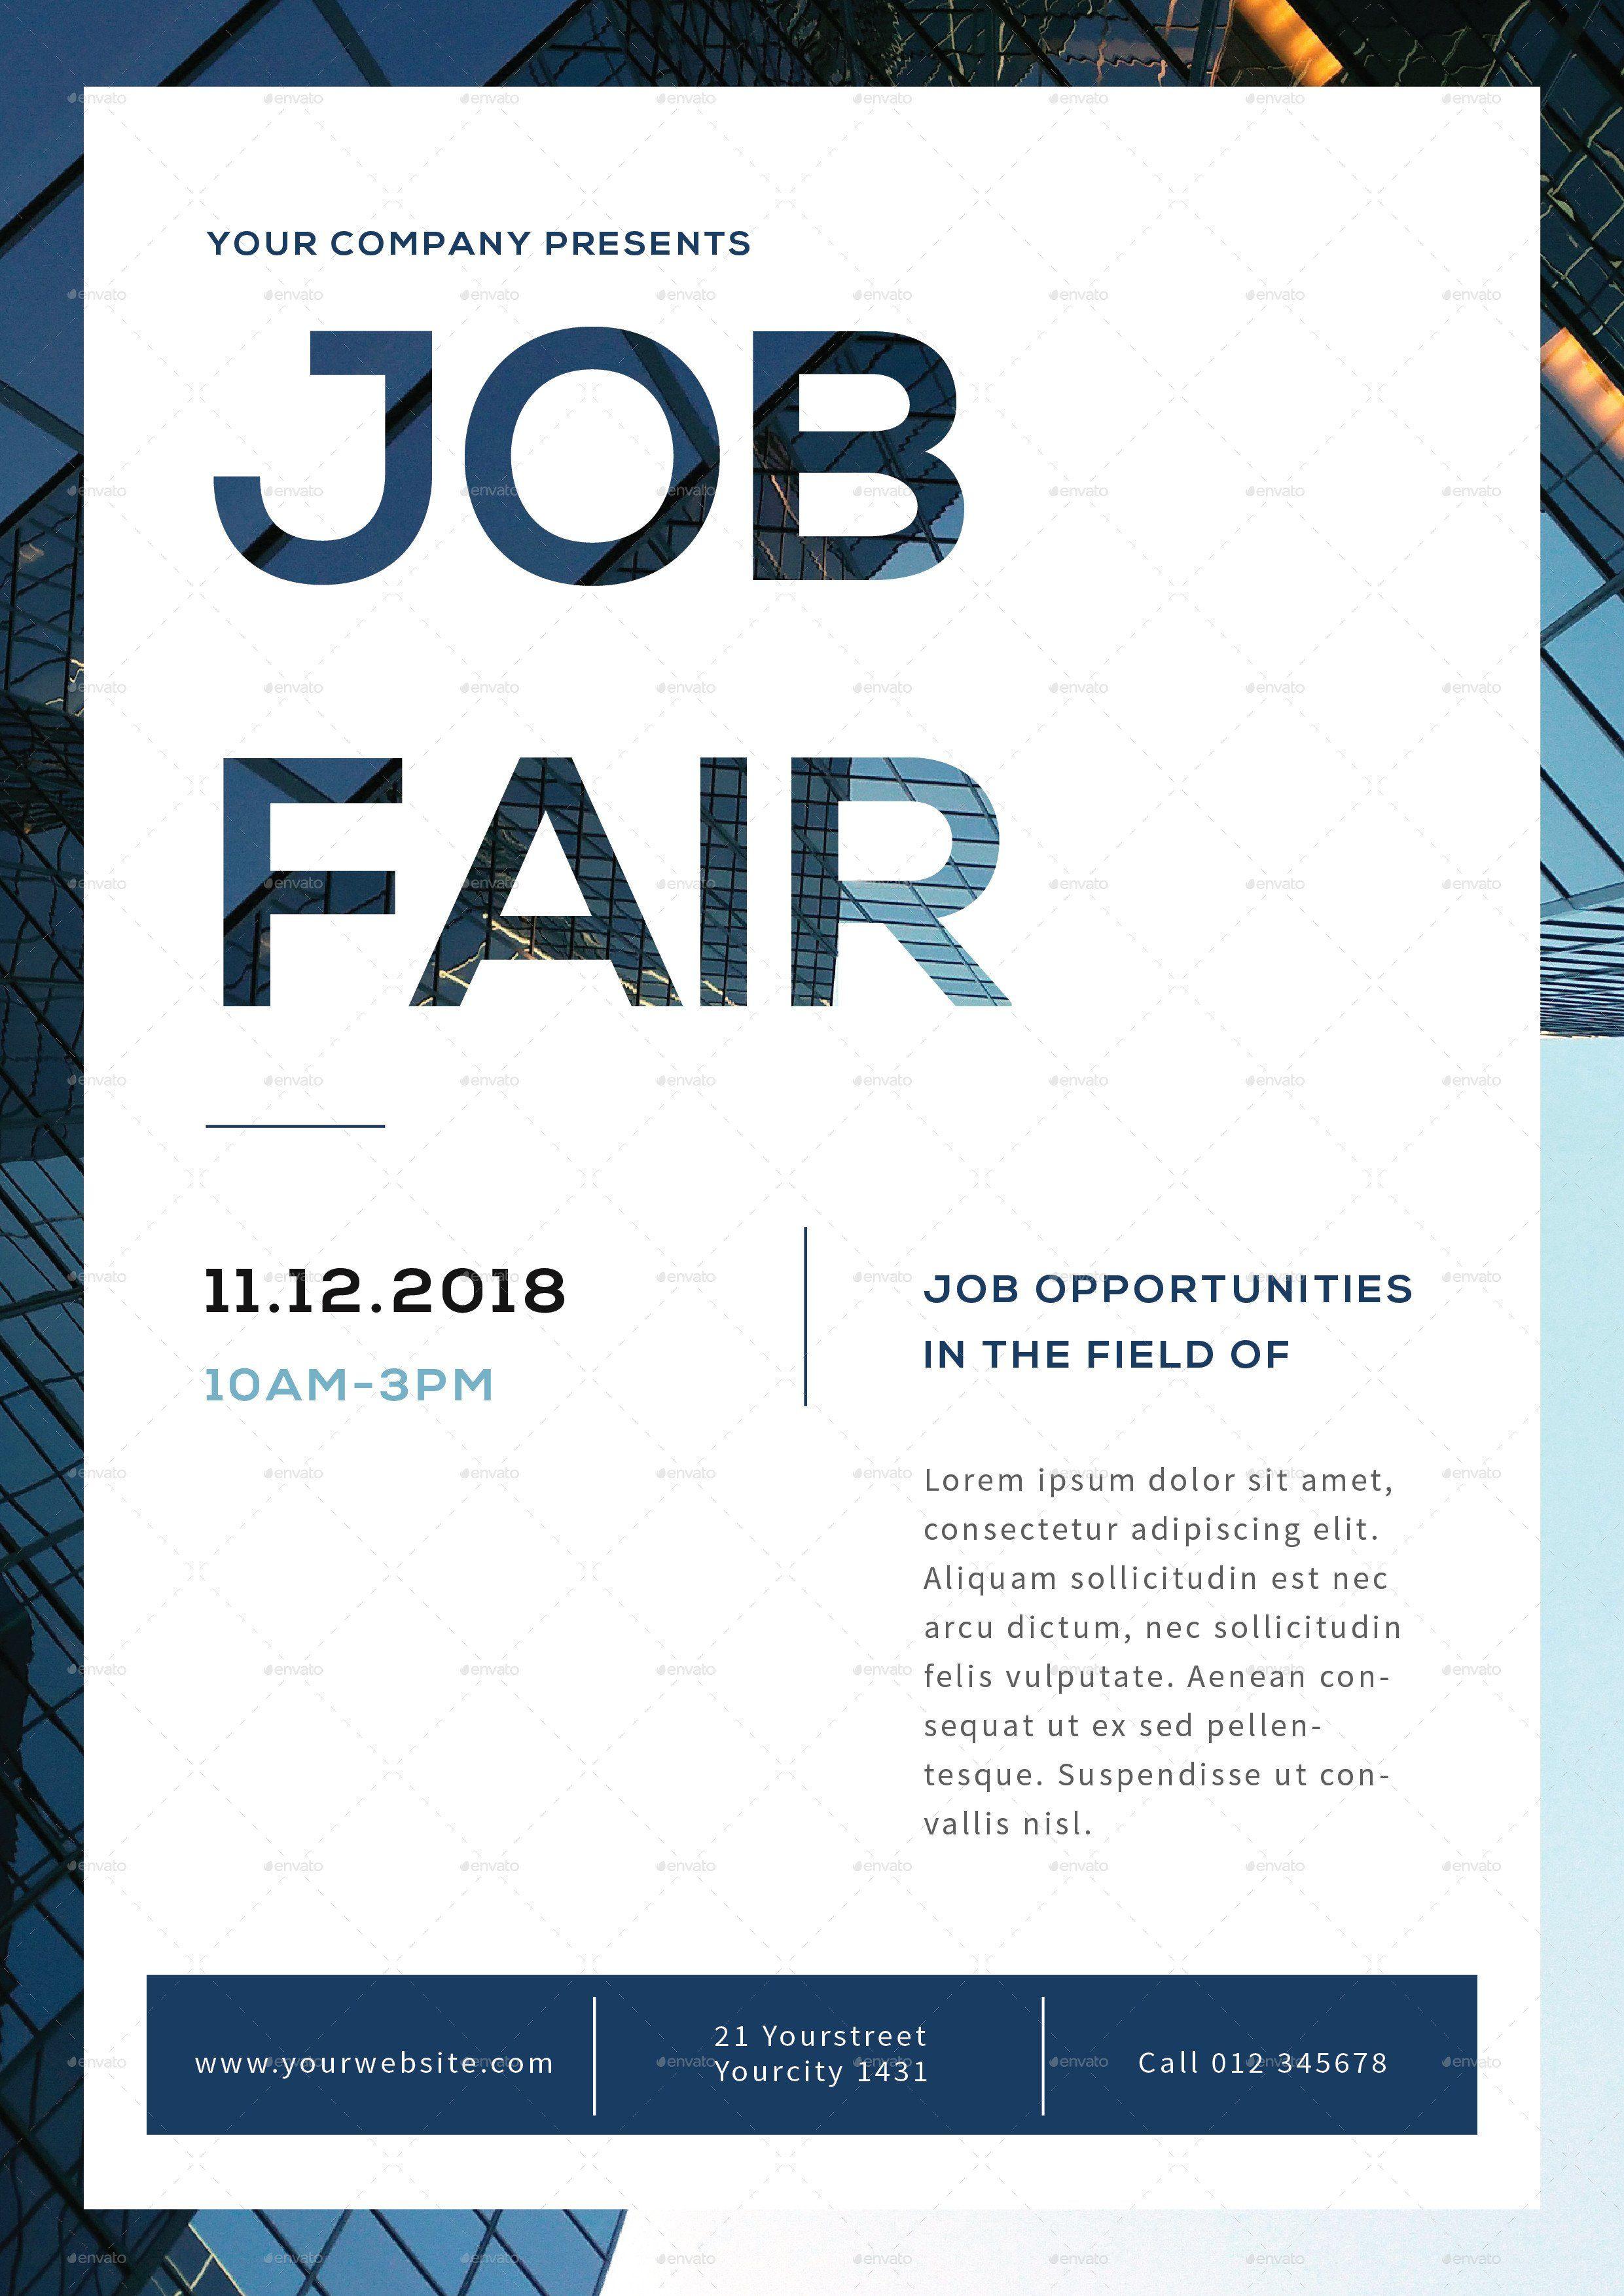 Job Fair Flyer Template Job Fair Flyer By Infinite Flyer Template Job Fair Event Flyer Templates Job fair flyer template free